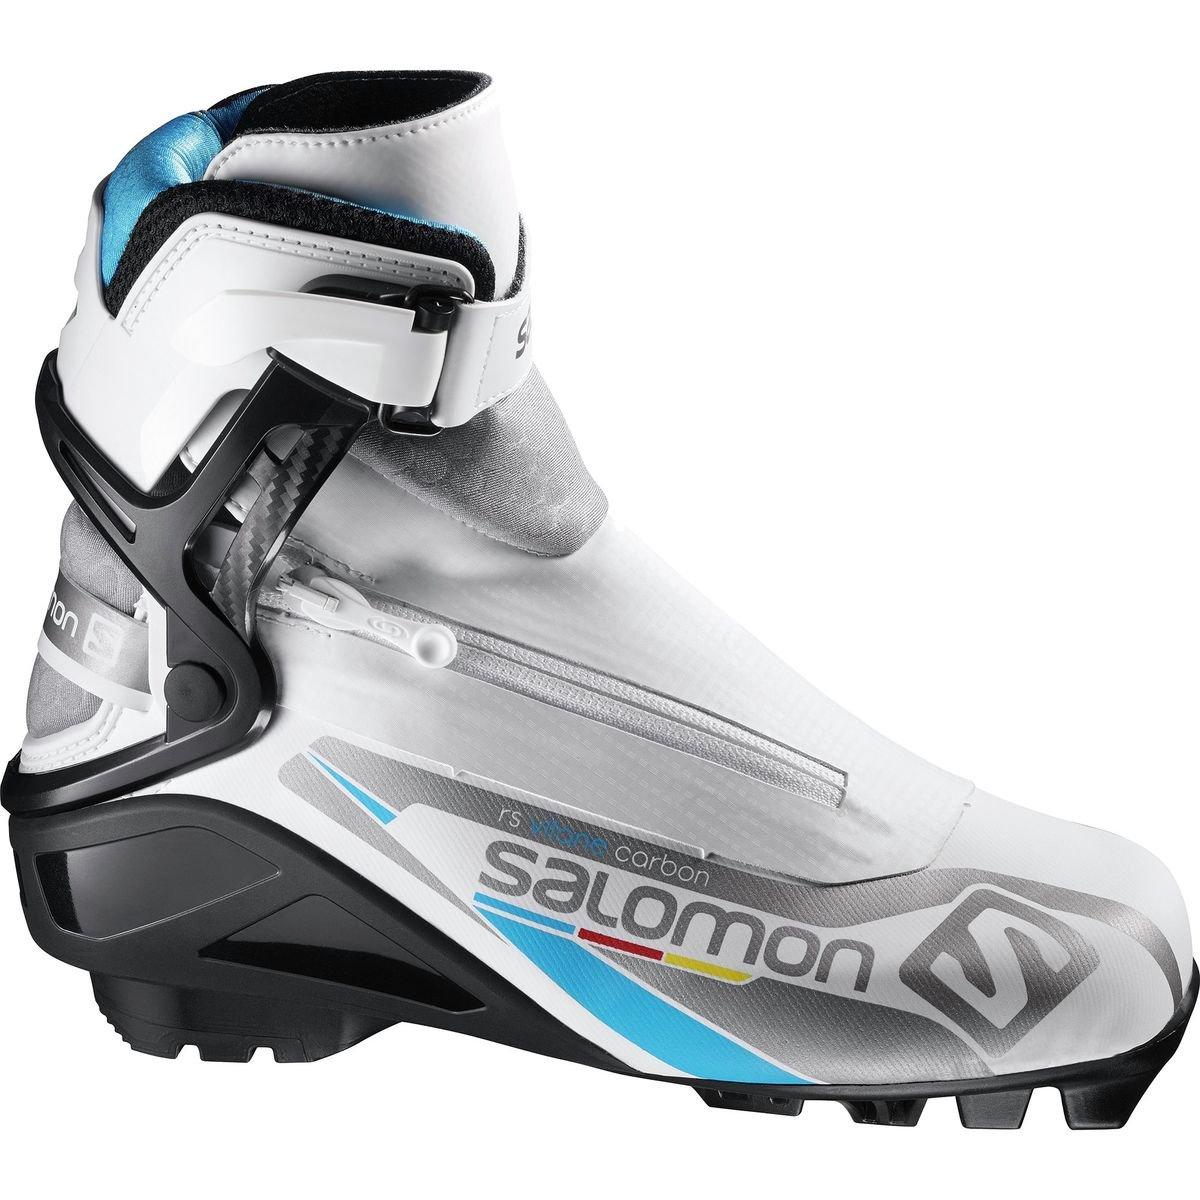 Salomon SNS RS Vitane Carbon Skate Boot - Women's White/Black, US 6.5/UK 5.0 by Salomon